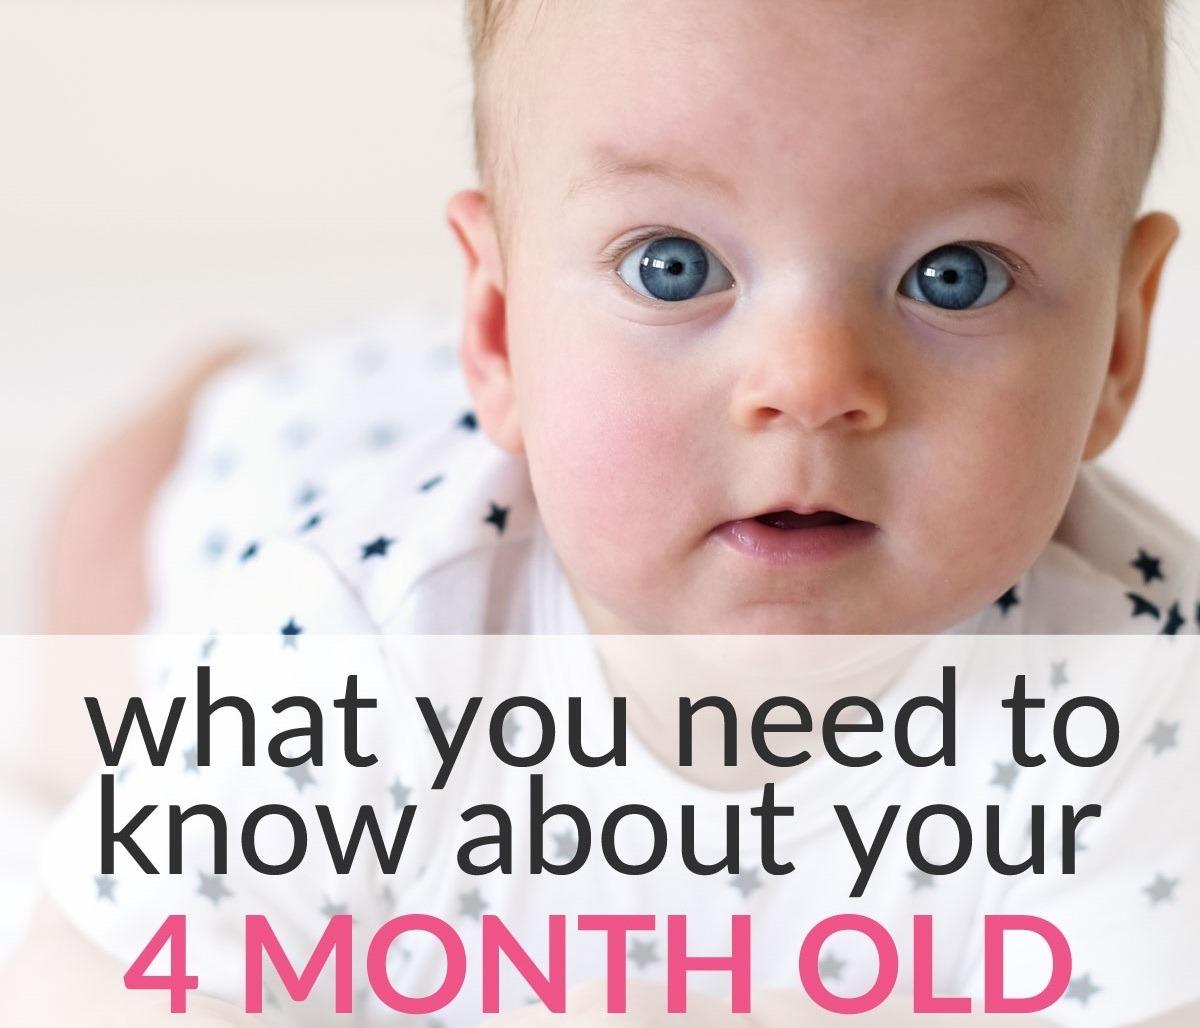 4-month-old baby development